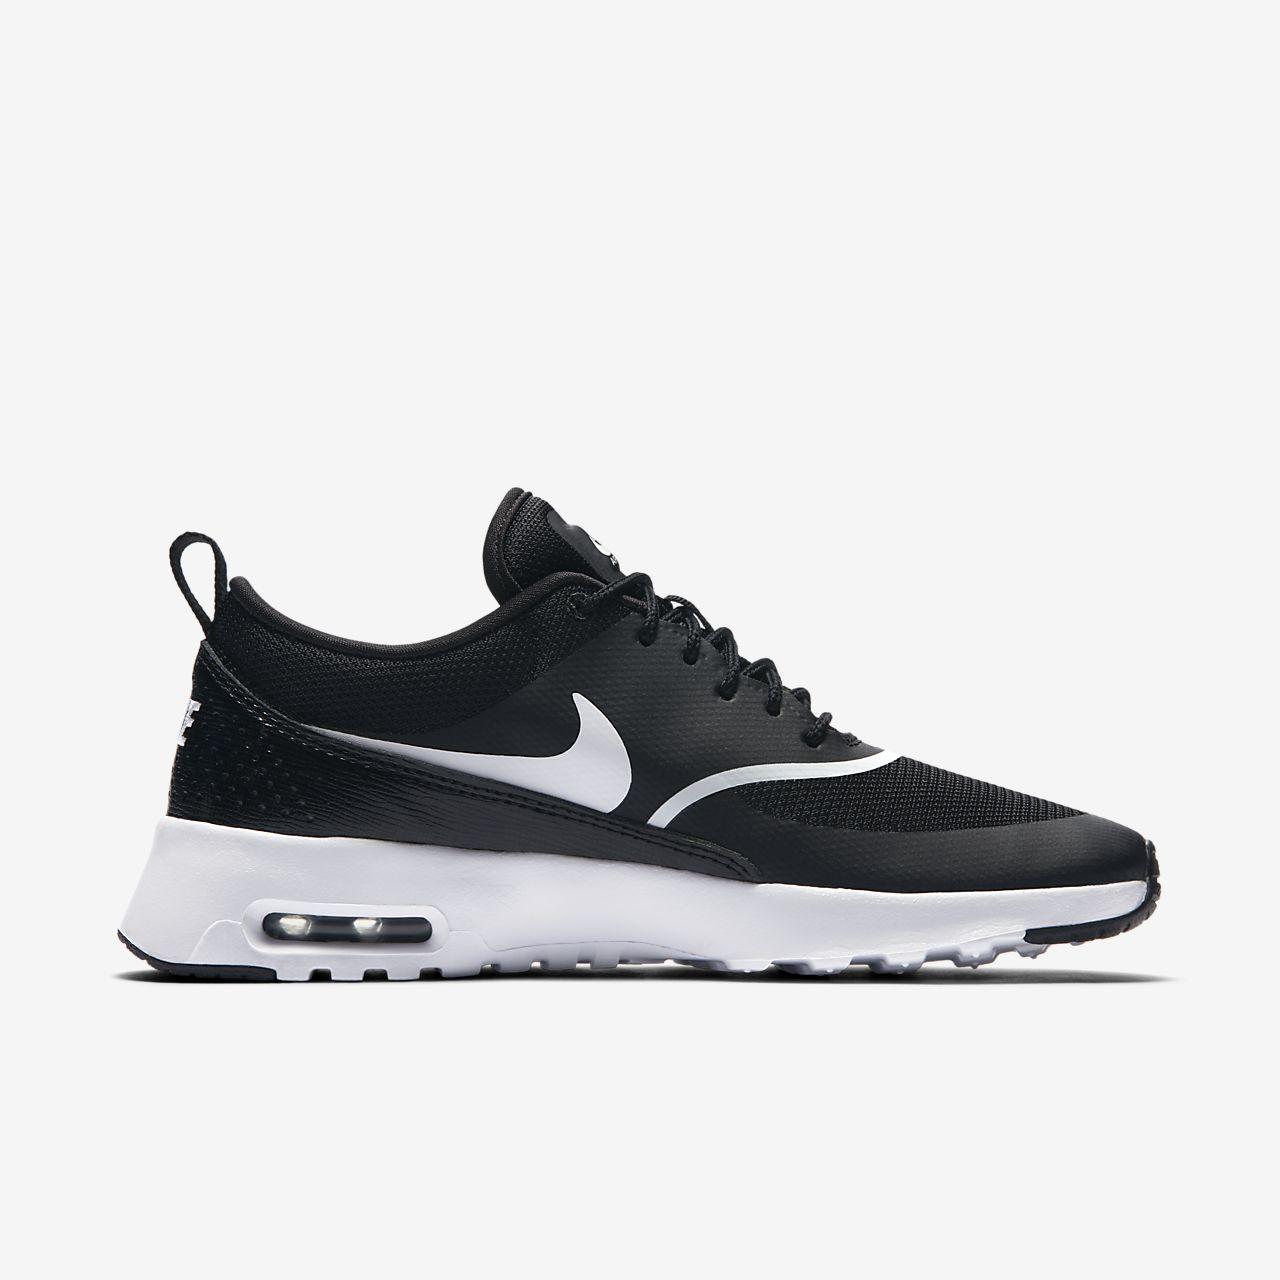 new style 9664e d674b Scarpa - Donna. Nike Air Max Thea